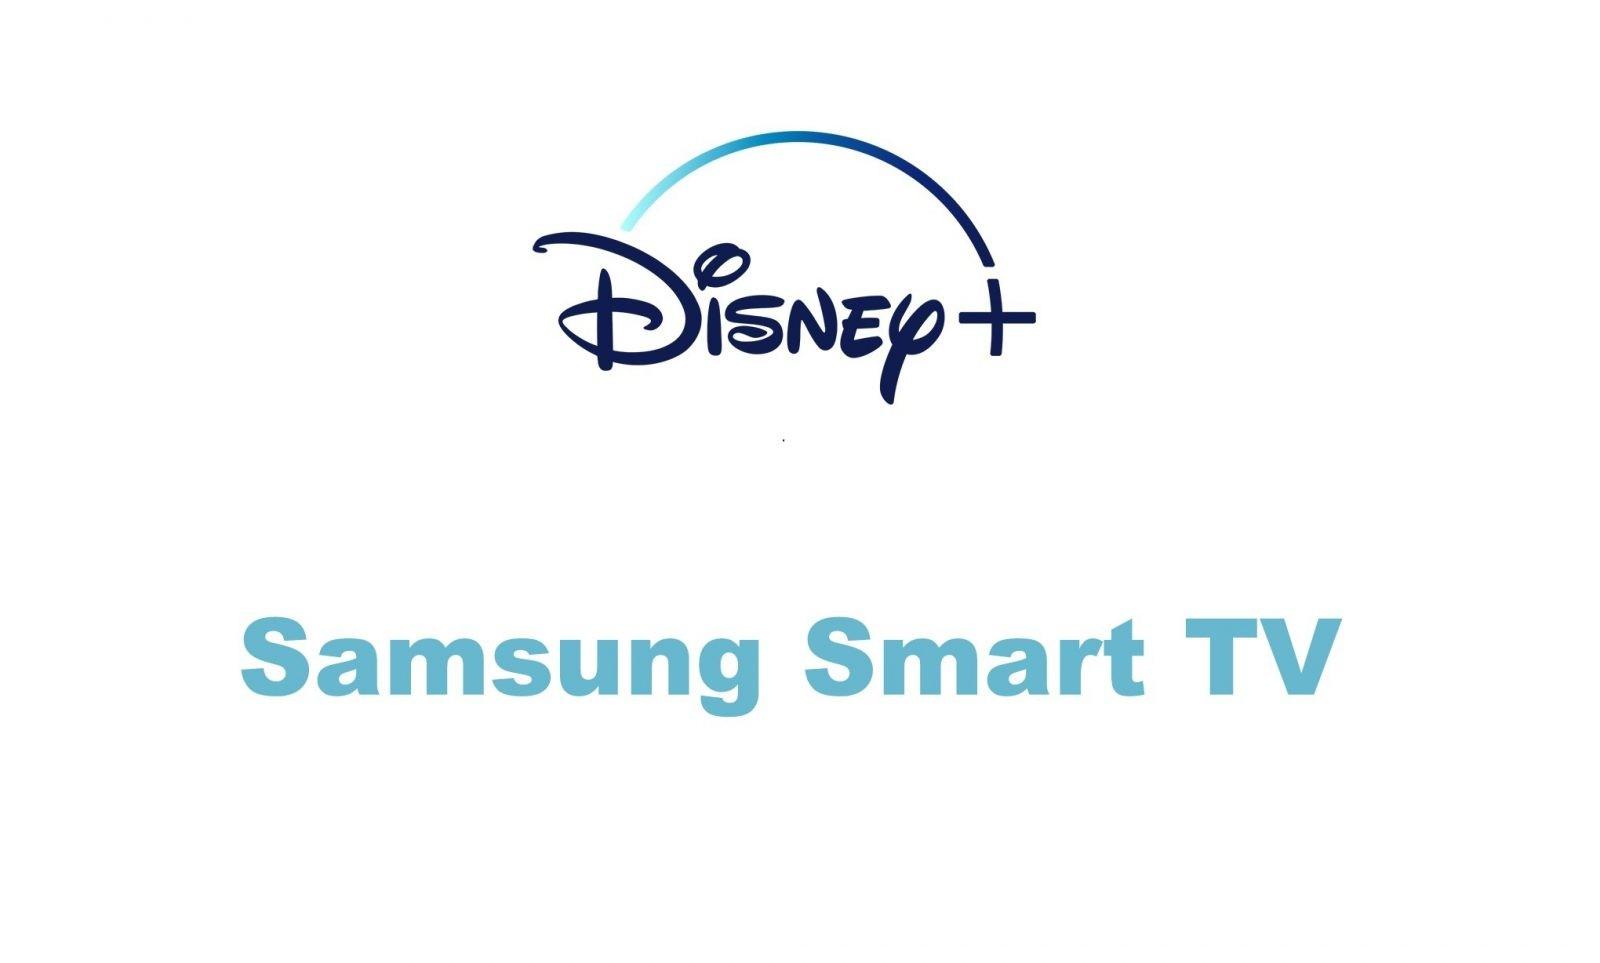 How to Watch Disney Plus on Samsung Smart TV